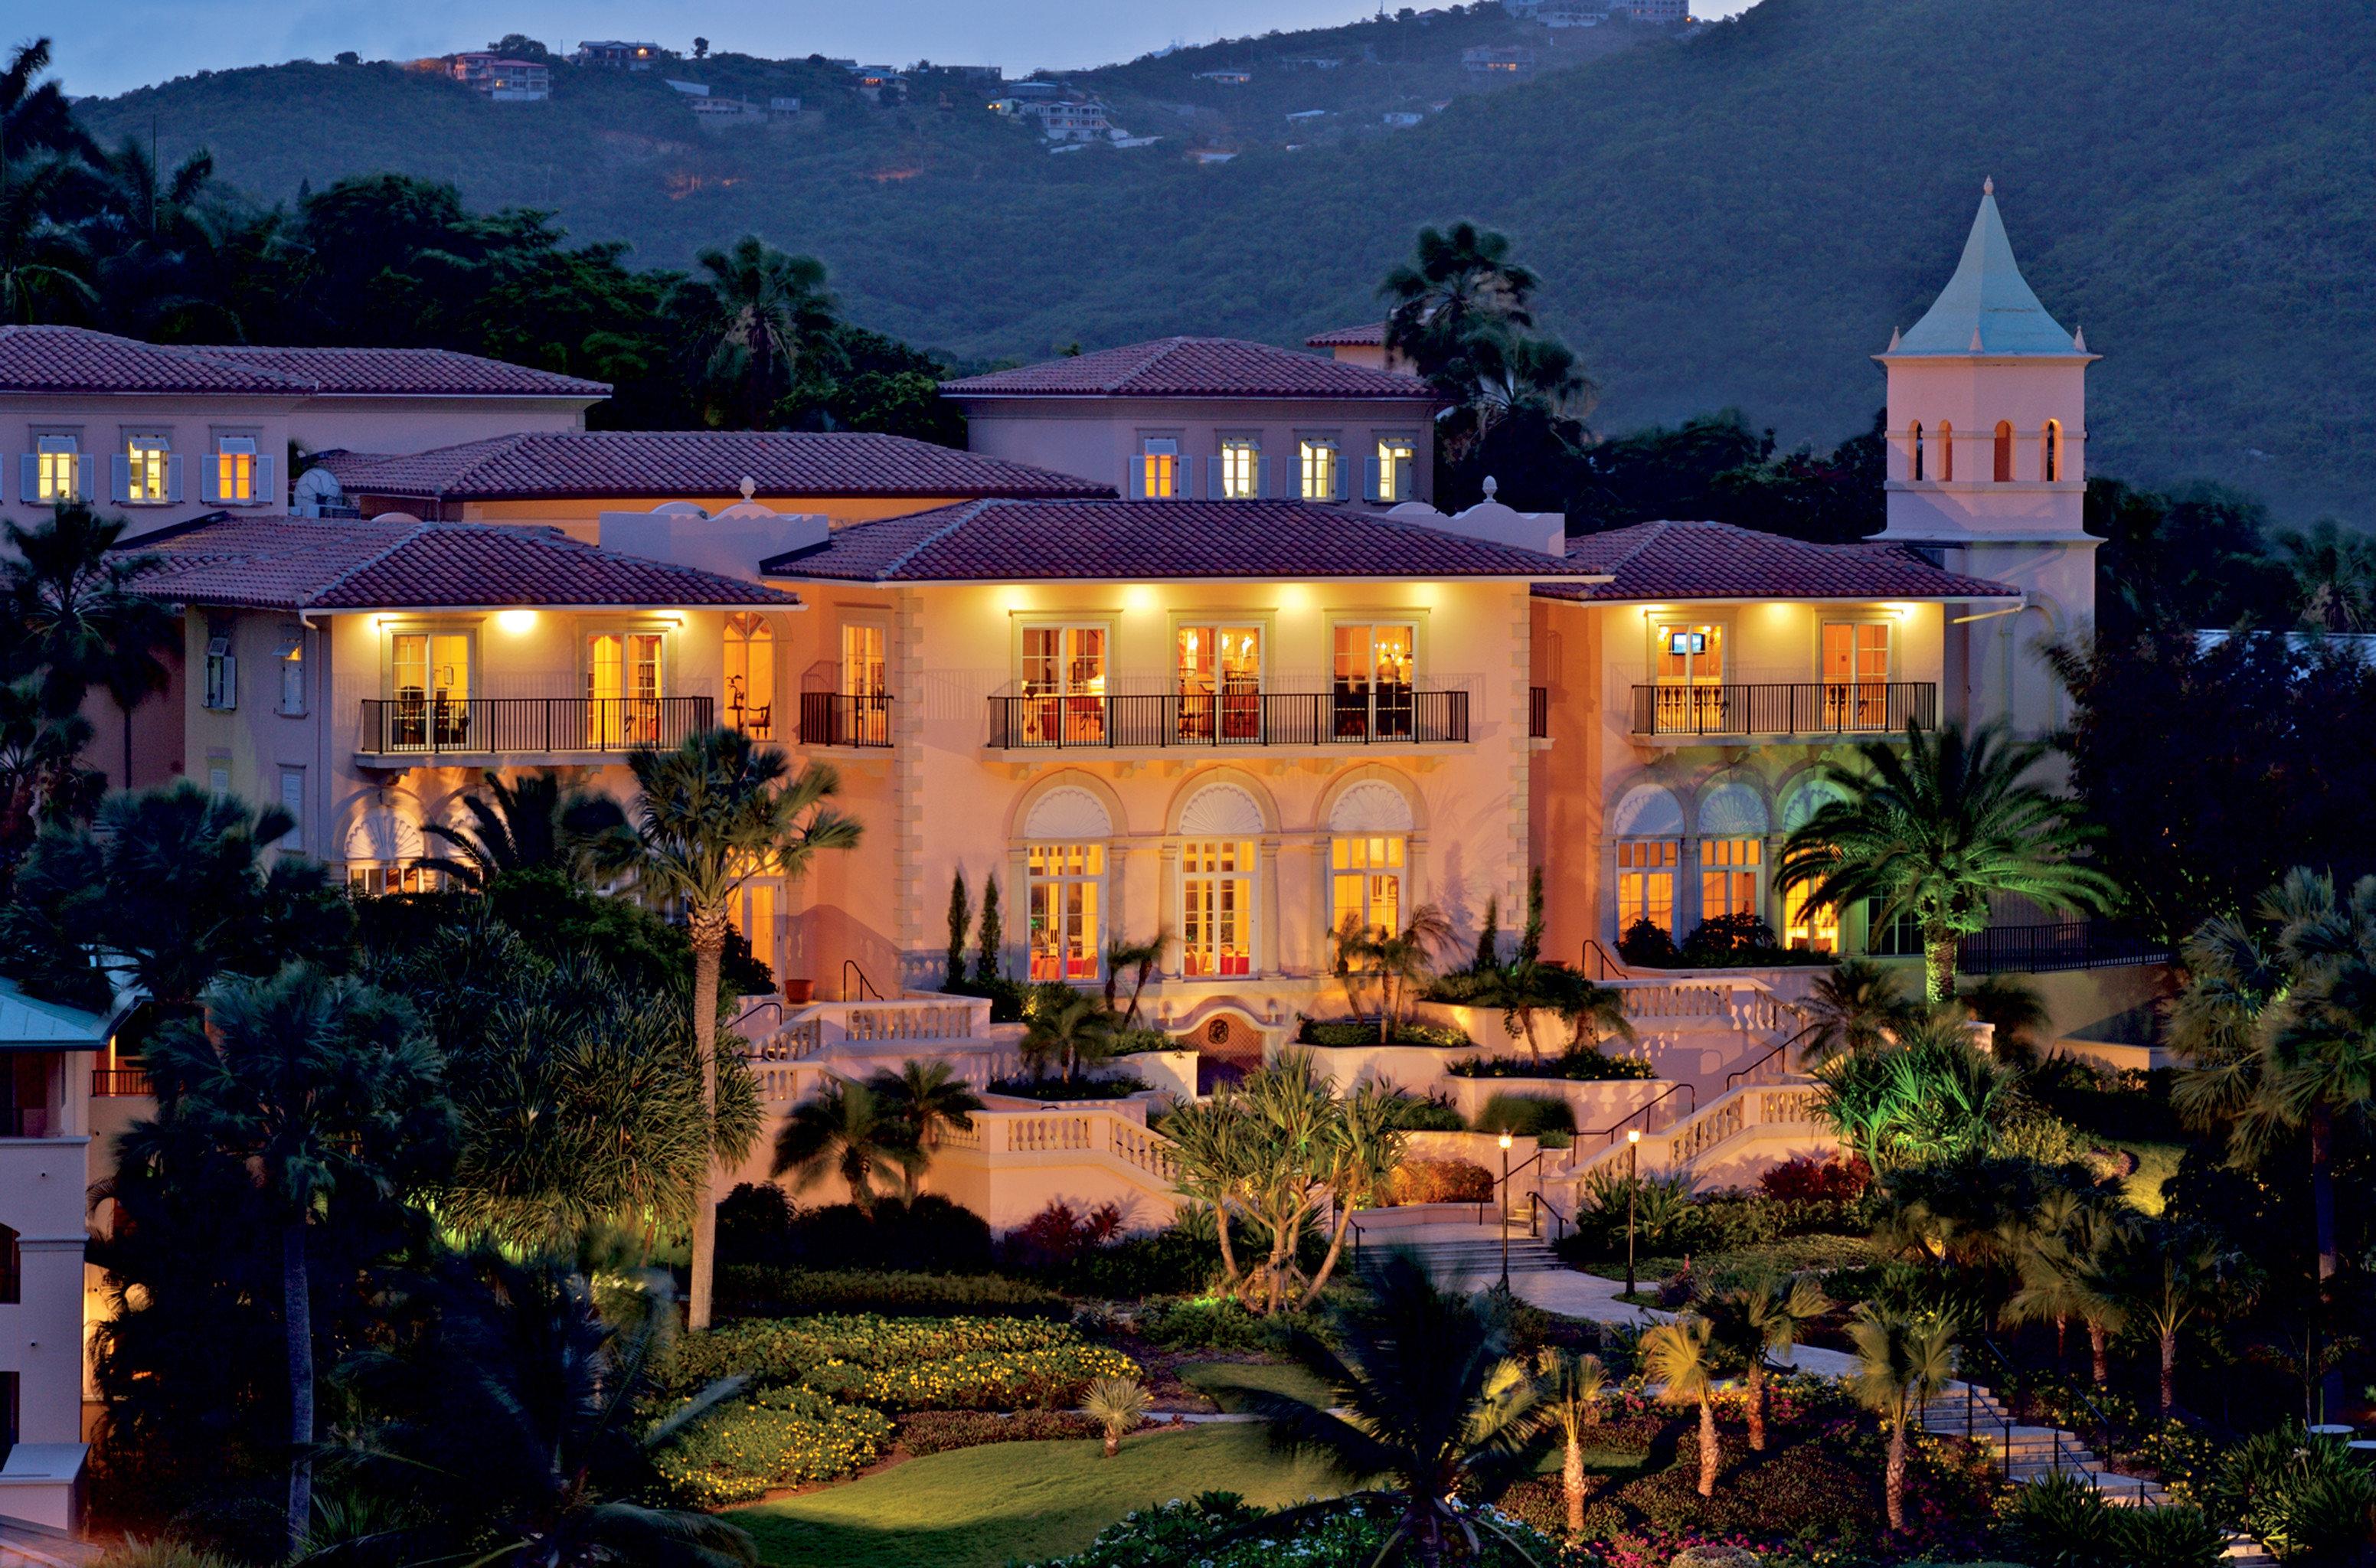 Hotels Romance building grass Resort house mansion home palace landscape lighting lush